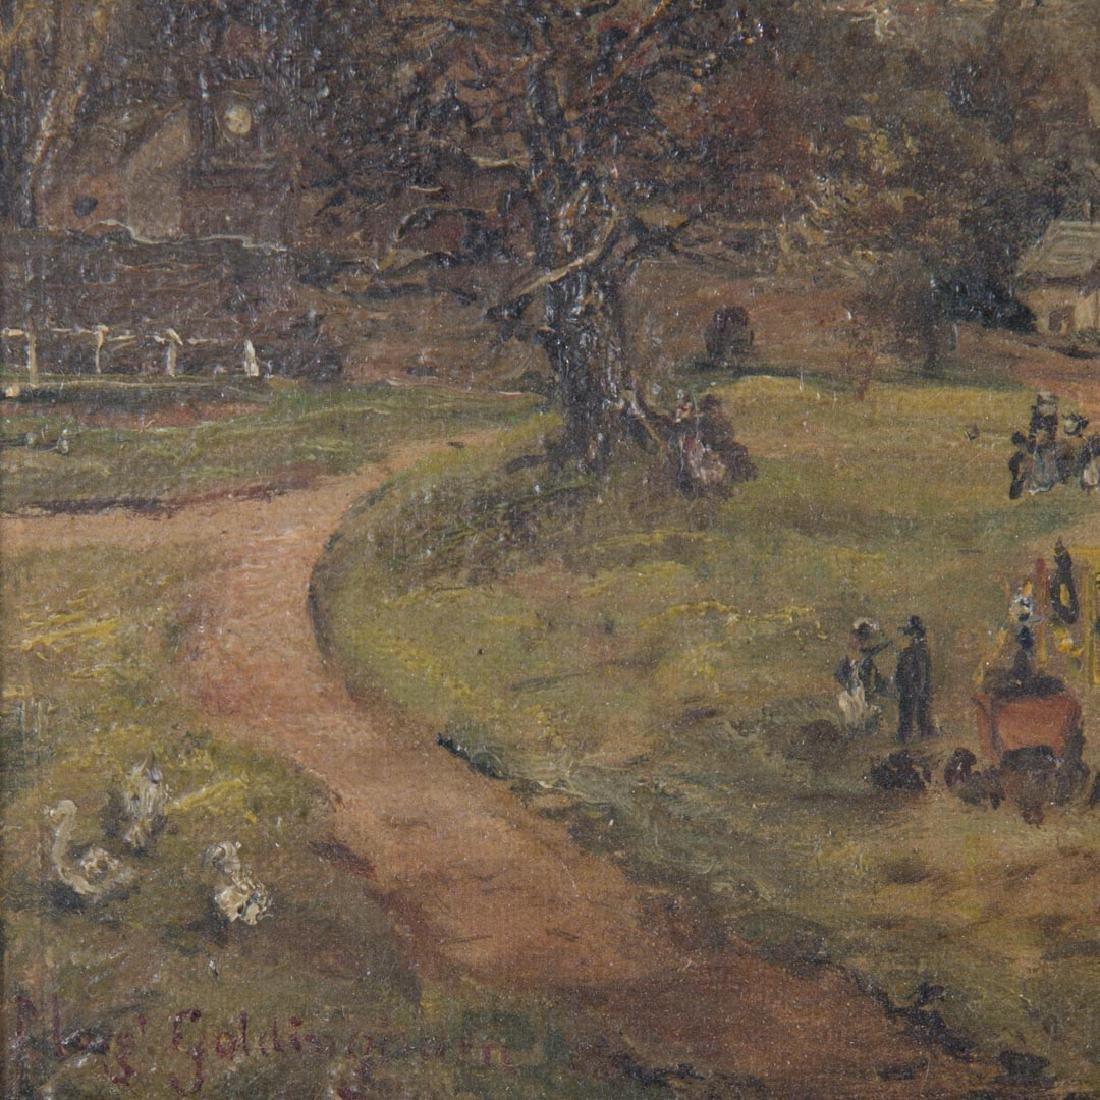 Margaret Goldingham. County Fair, oil on canvas - 2